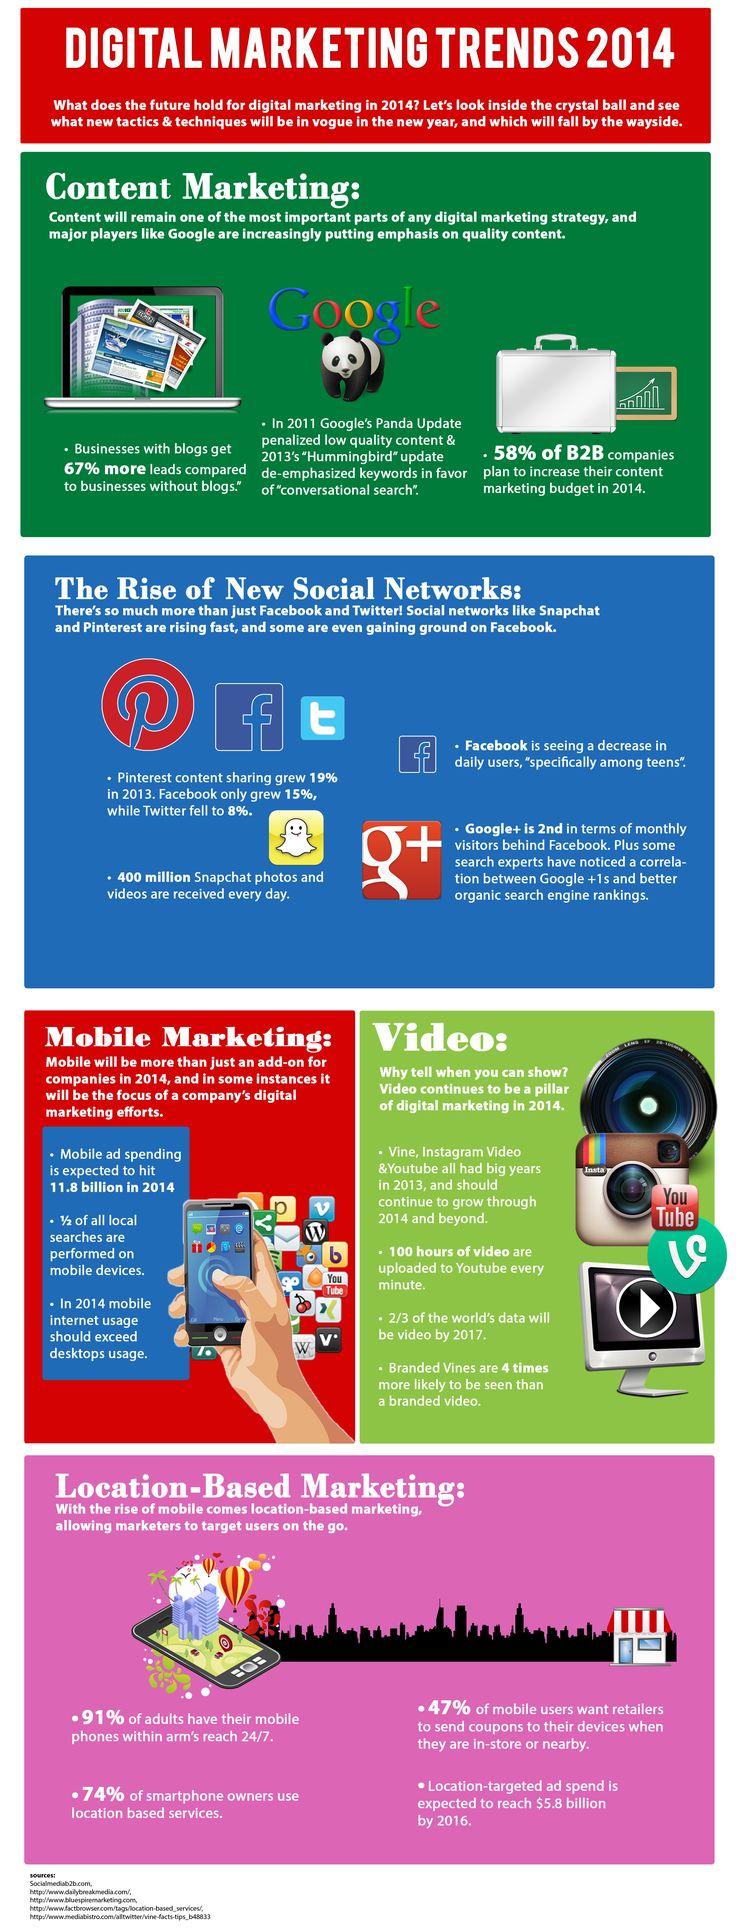 Digital Marketing Trends 2014   #Infographic #Marketing #DigitalMarketing